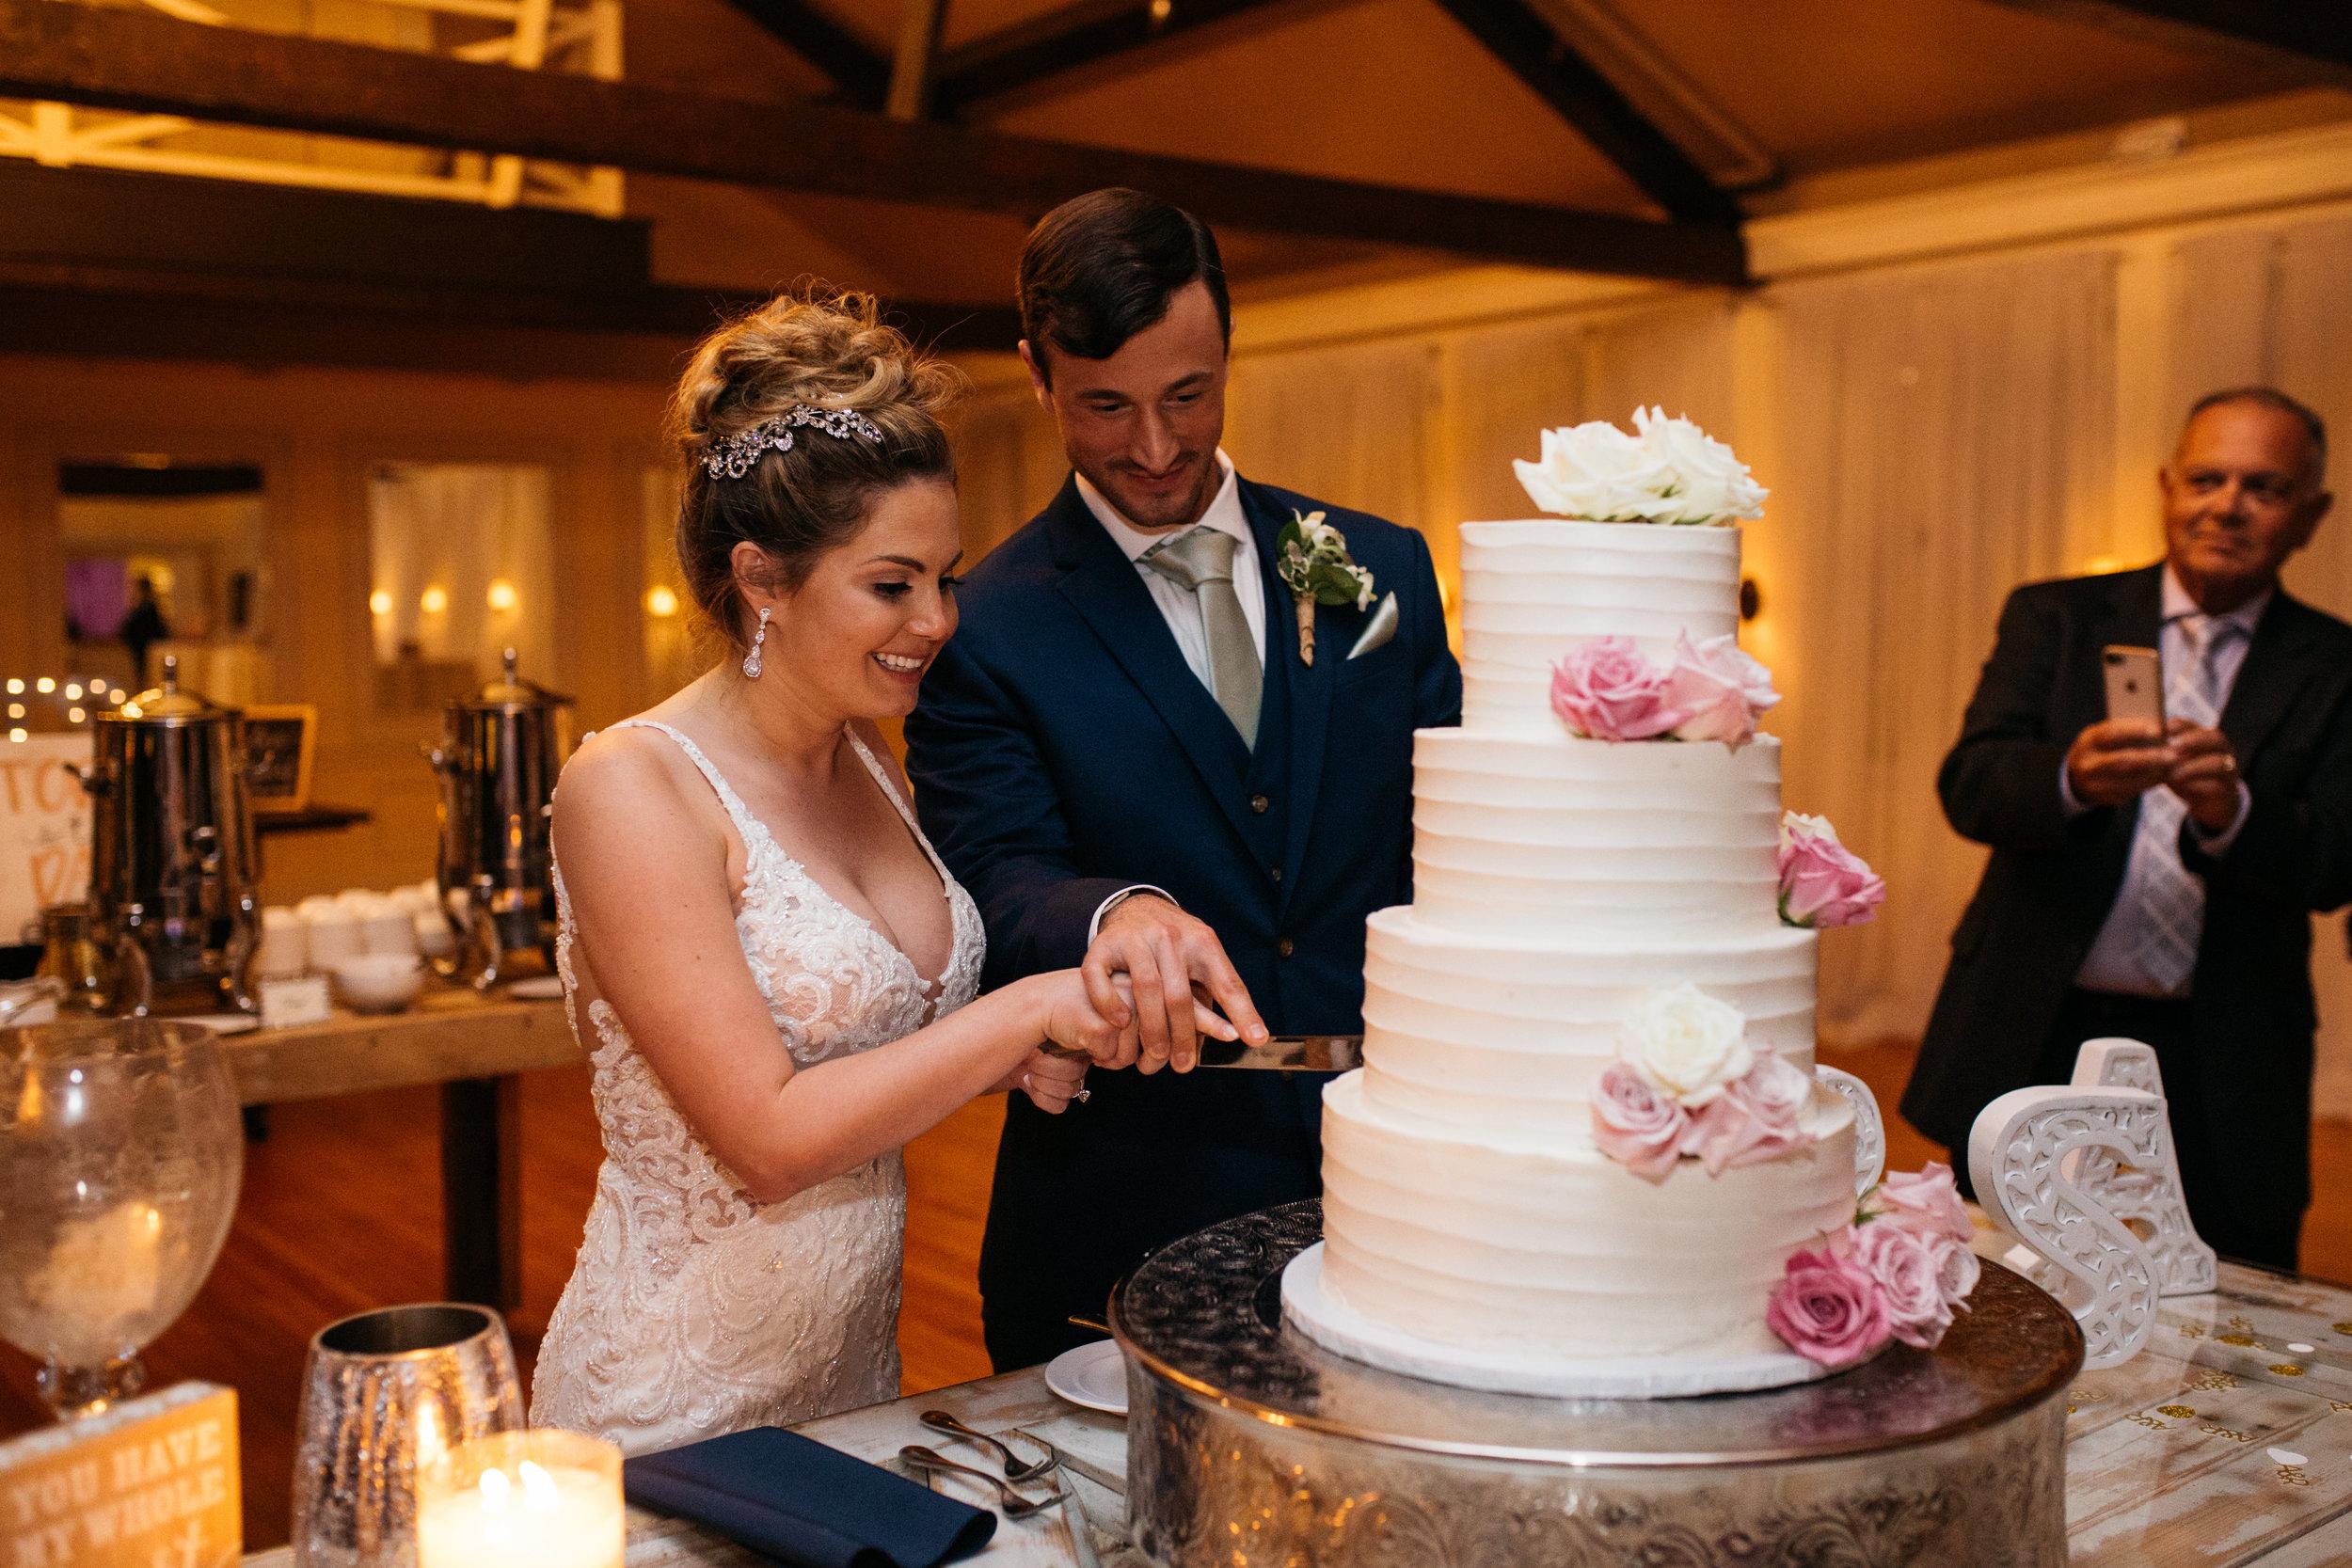 old_daley_on_crooked_lake_wedding_-102.jpg